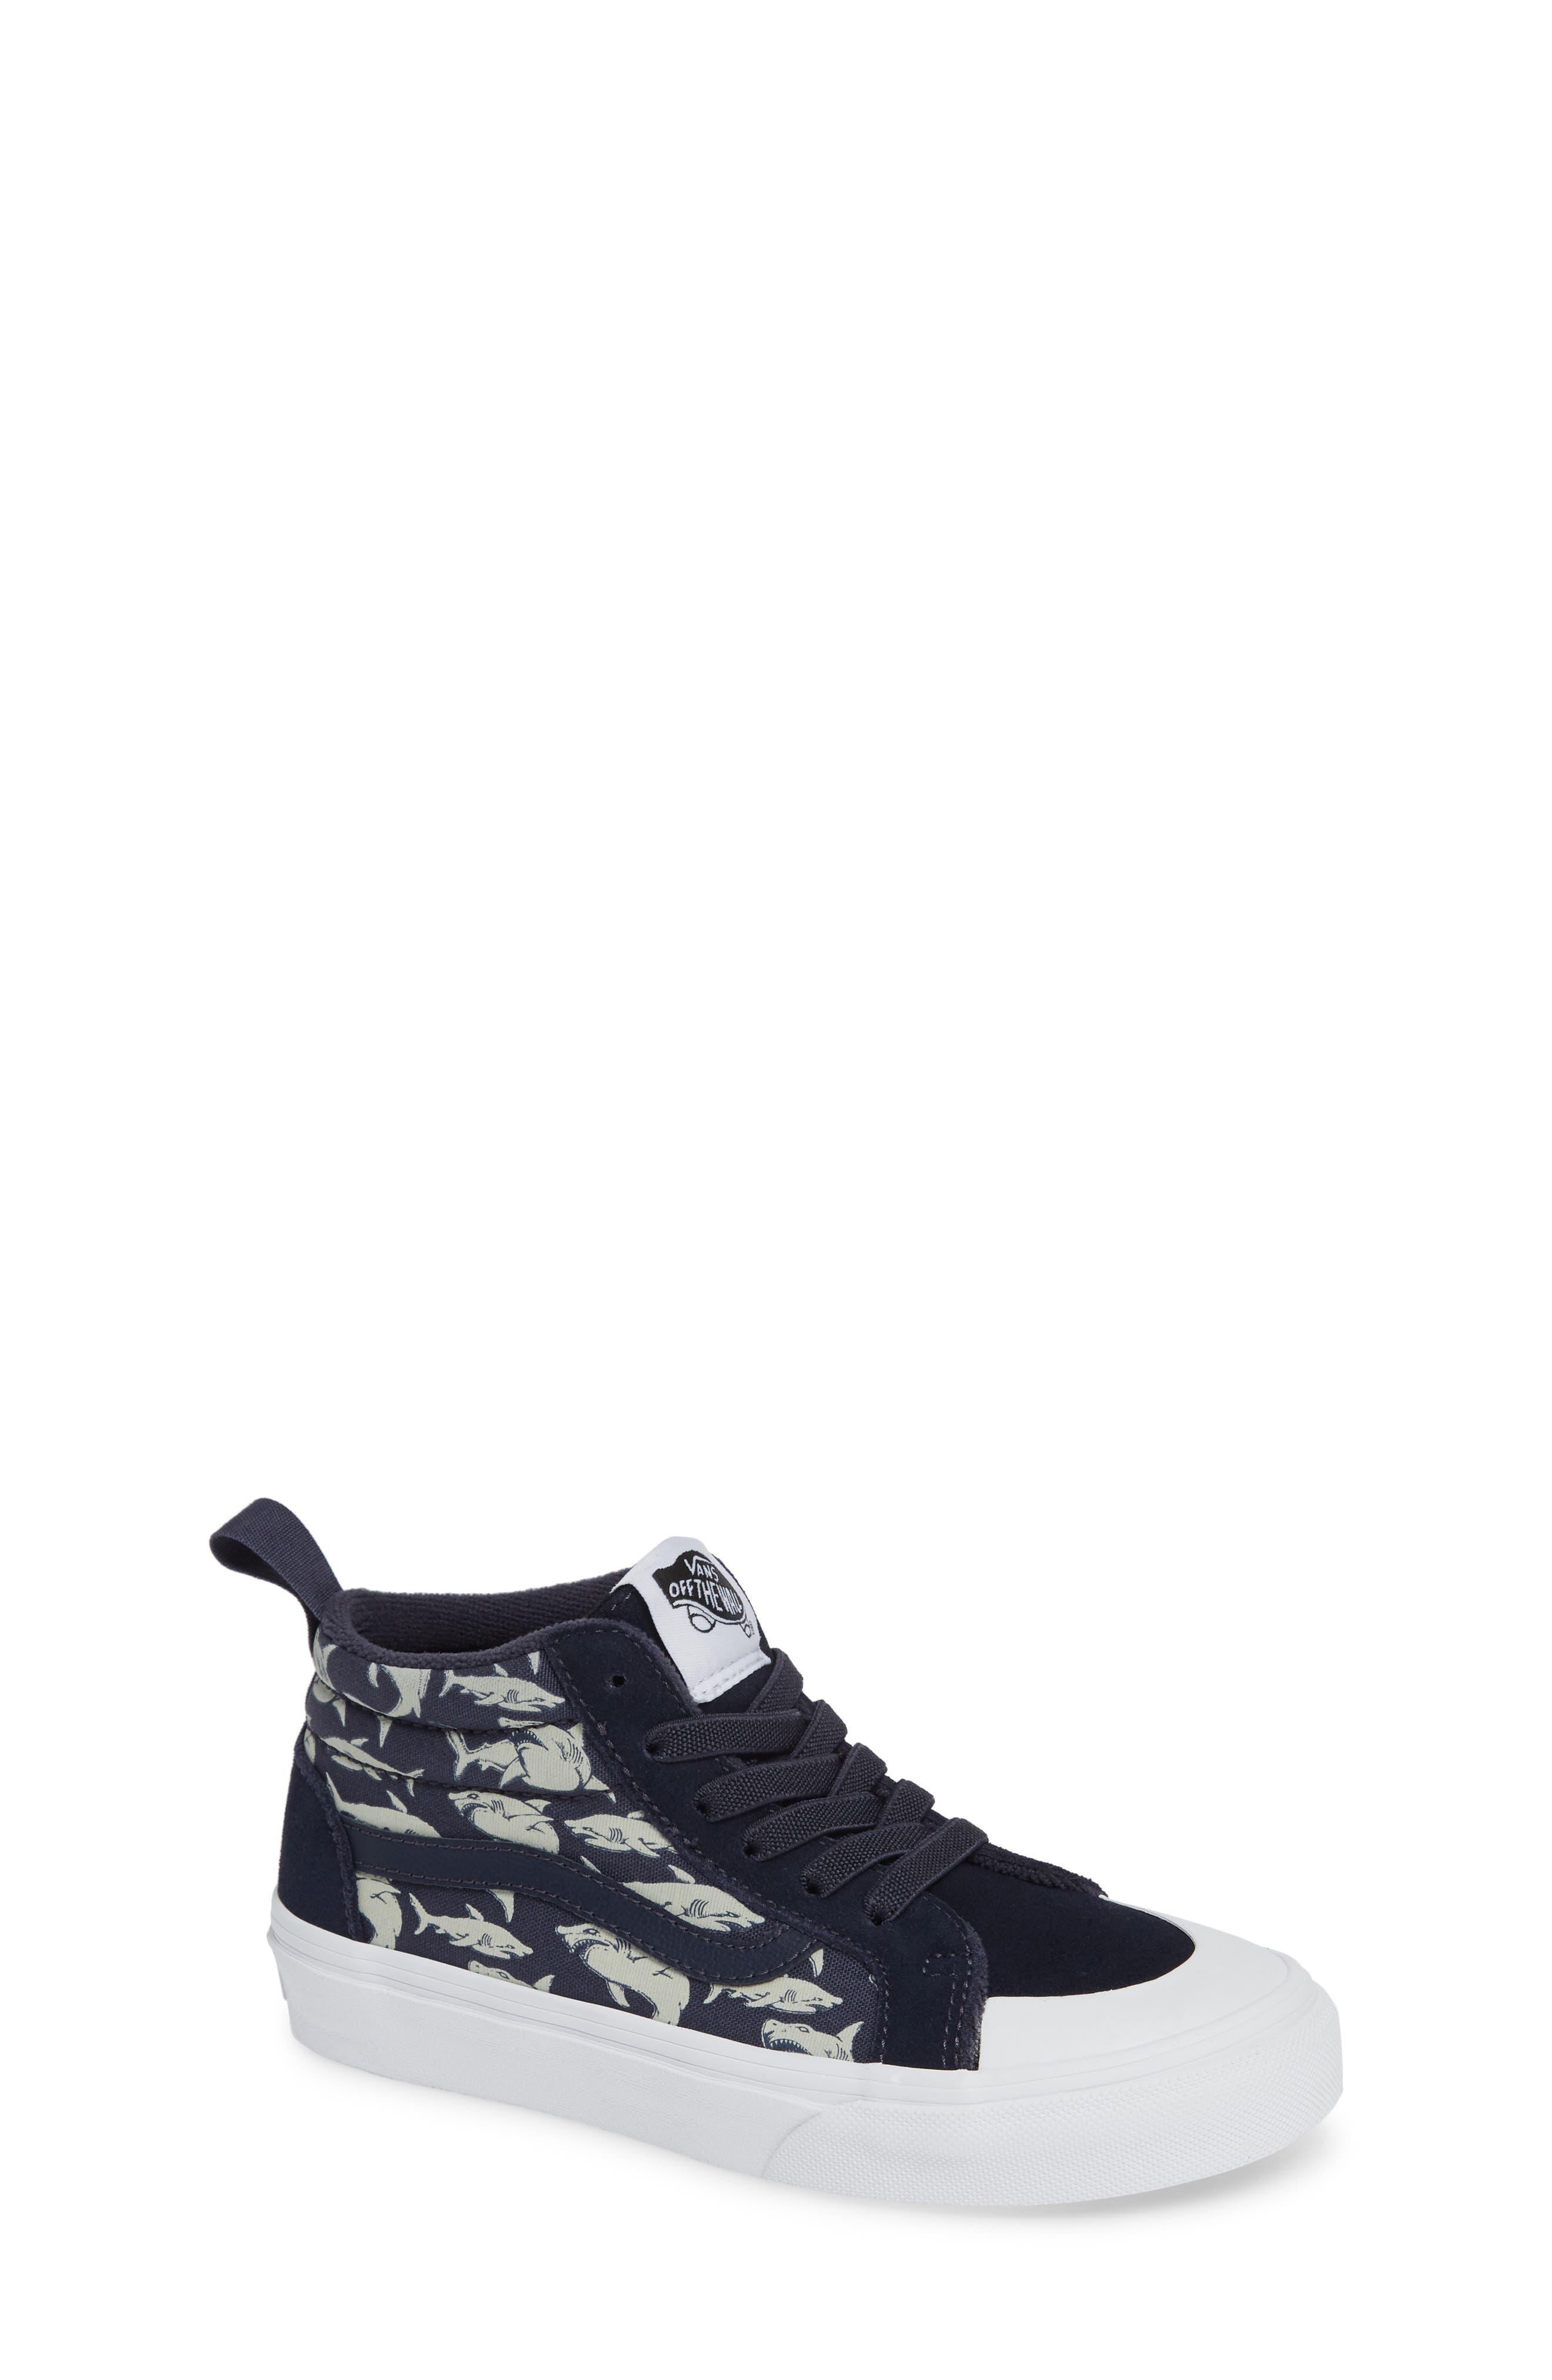 Racer Mid Elastic Lace Sneaker,                         Main,                         color, GLOW SHARKS PARISIAN NIGHT